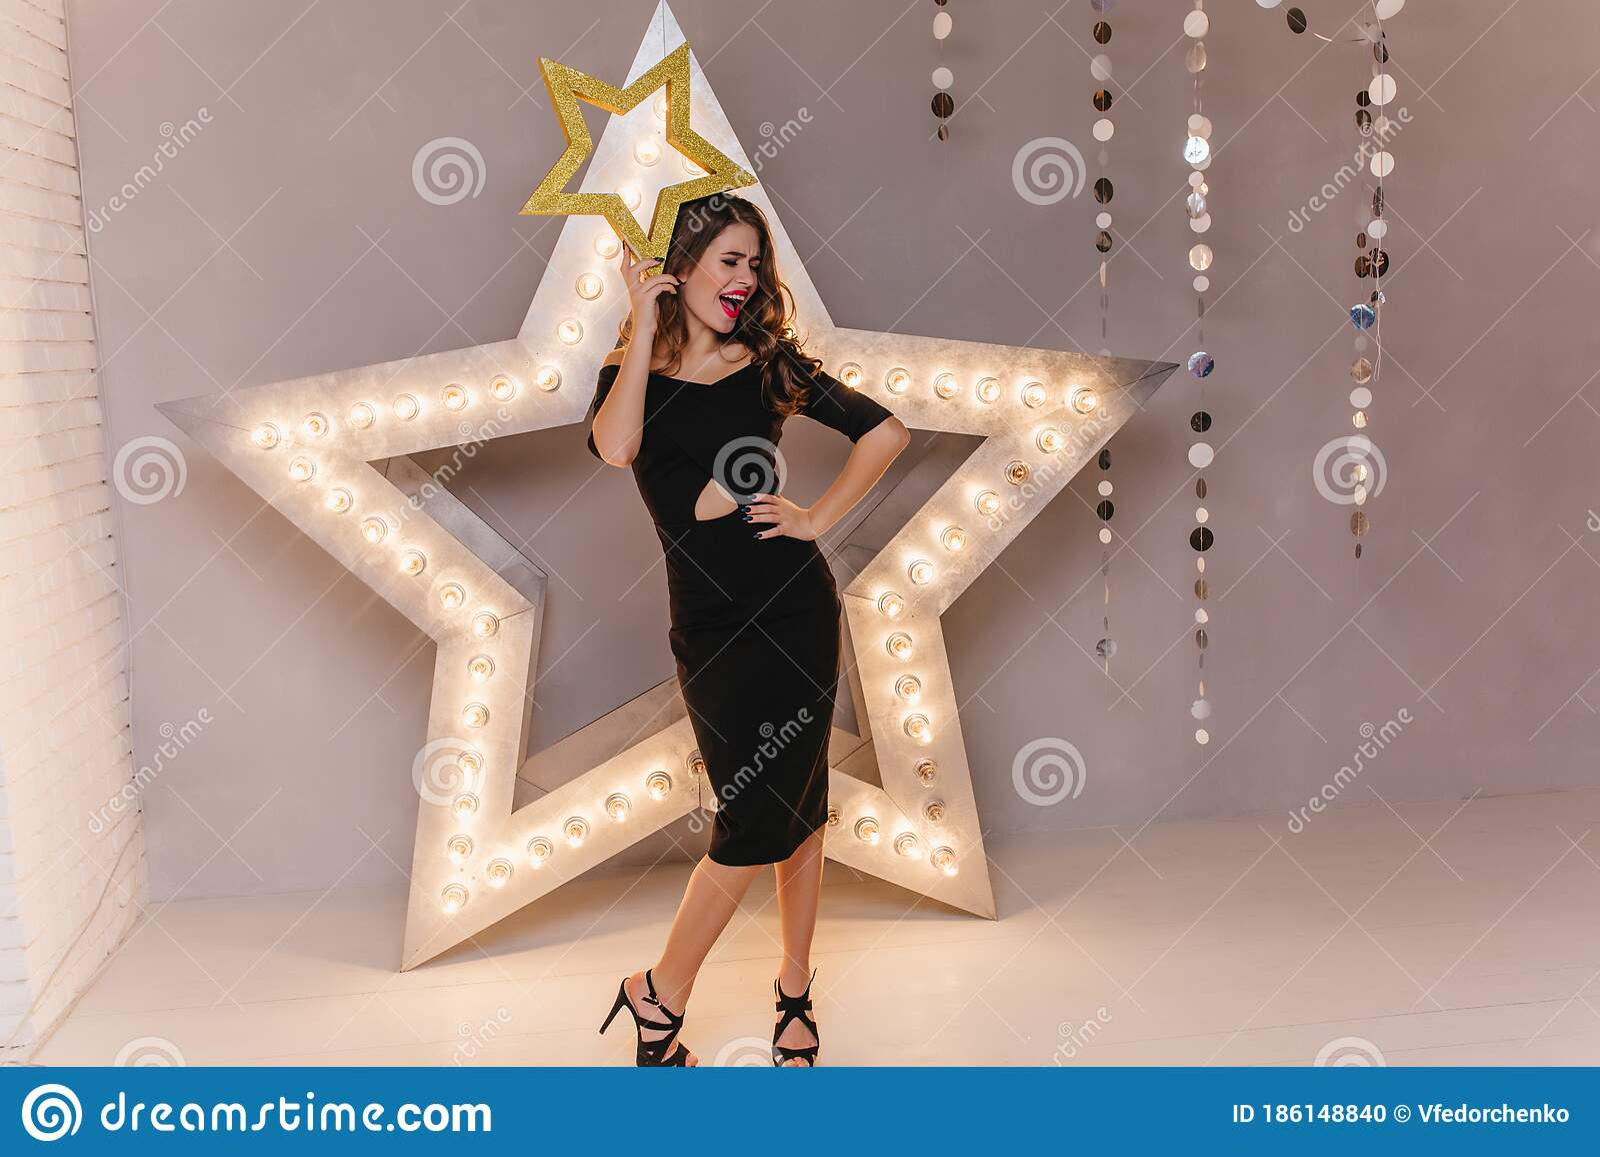 Mischievous Lady In Black Dress